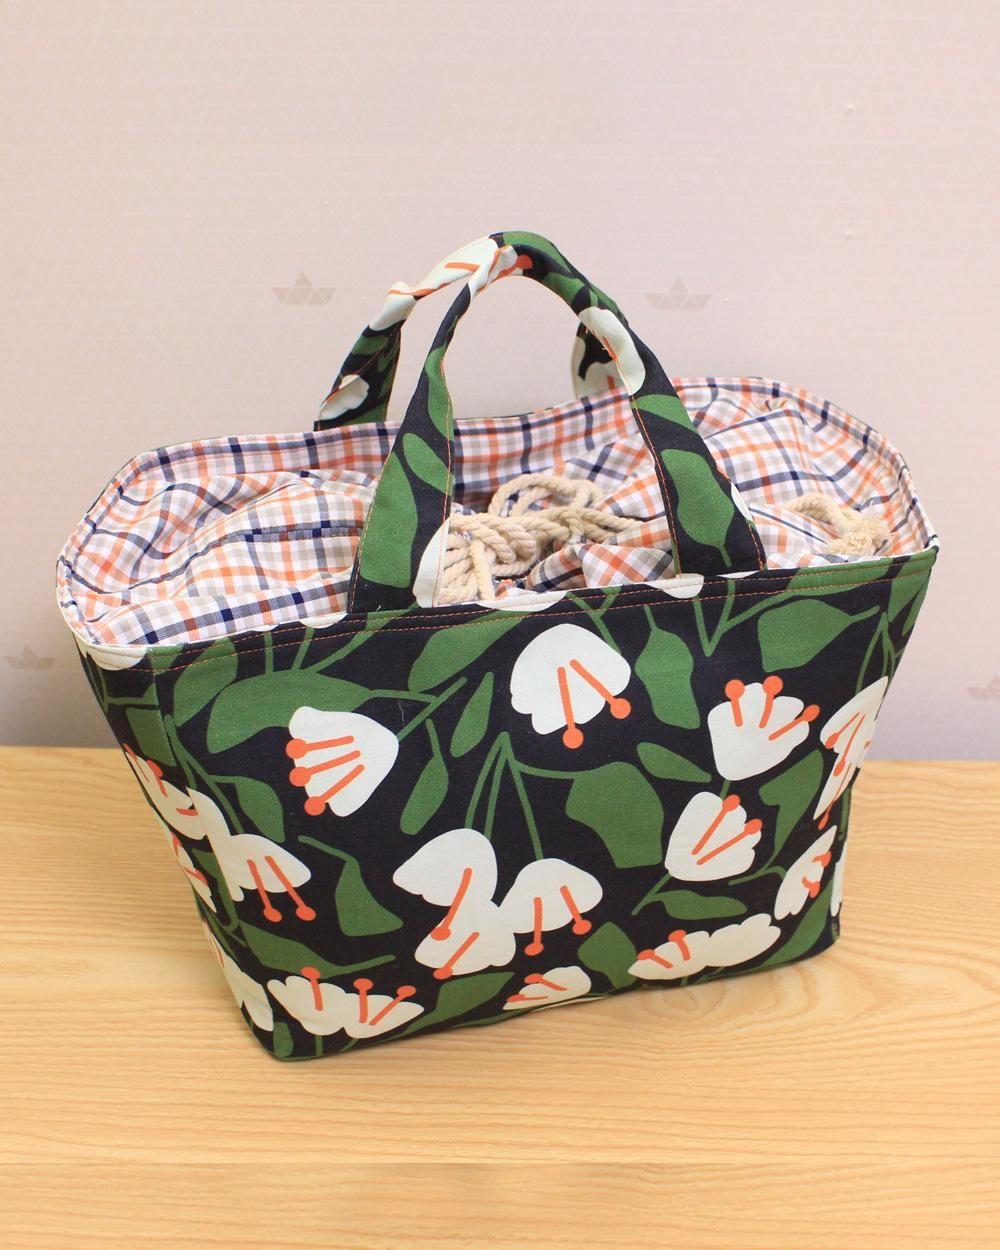 DIY MARKET TOTE BAG | Shopping Bag Sewing Tutorial | Basket bag [sewingtimes